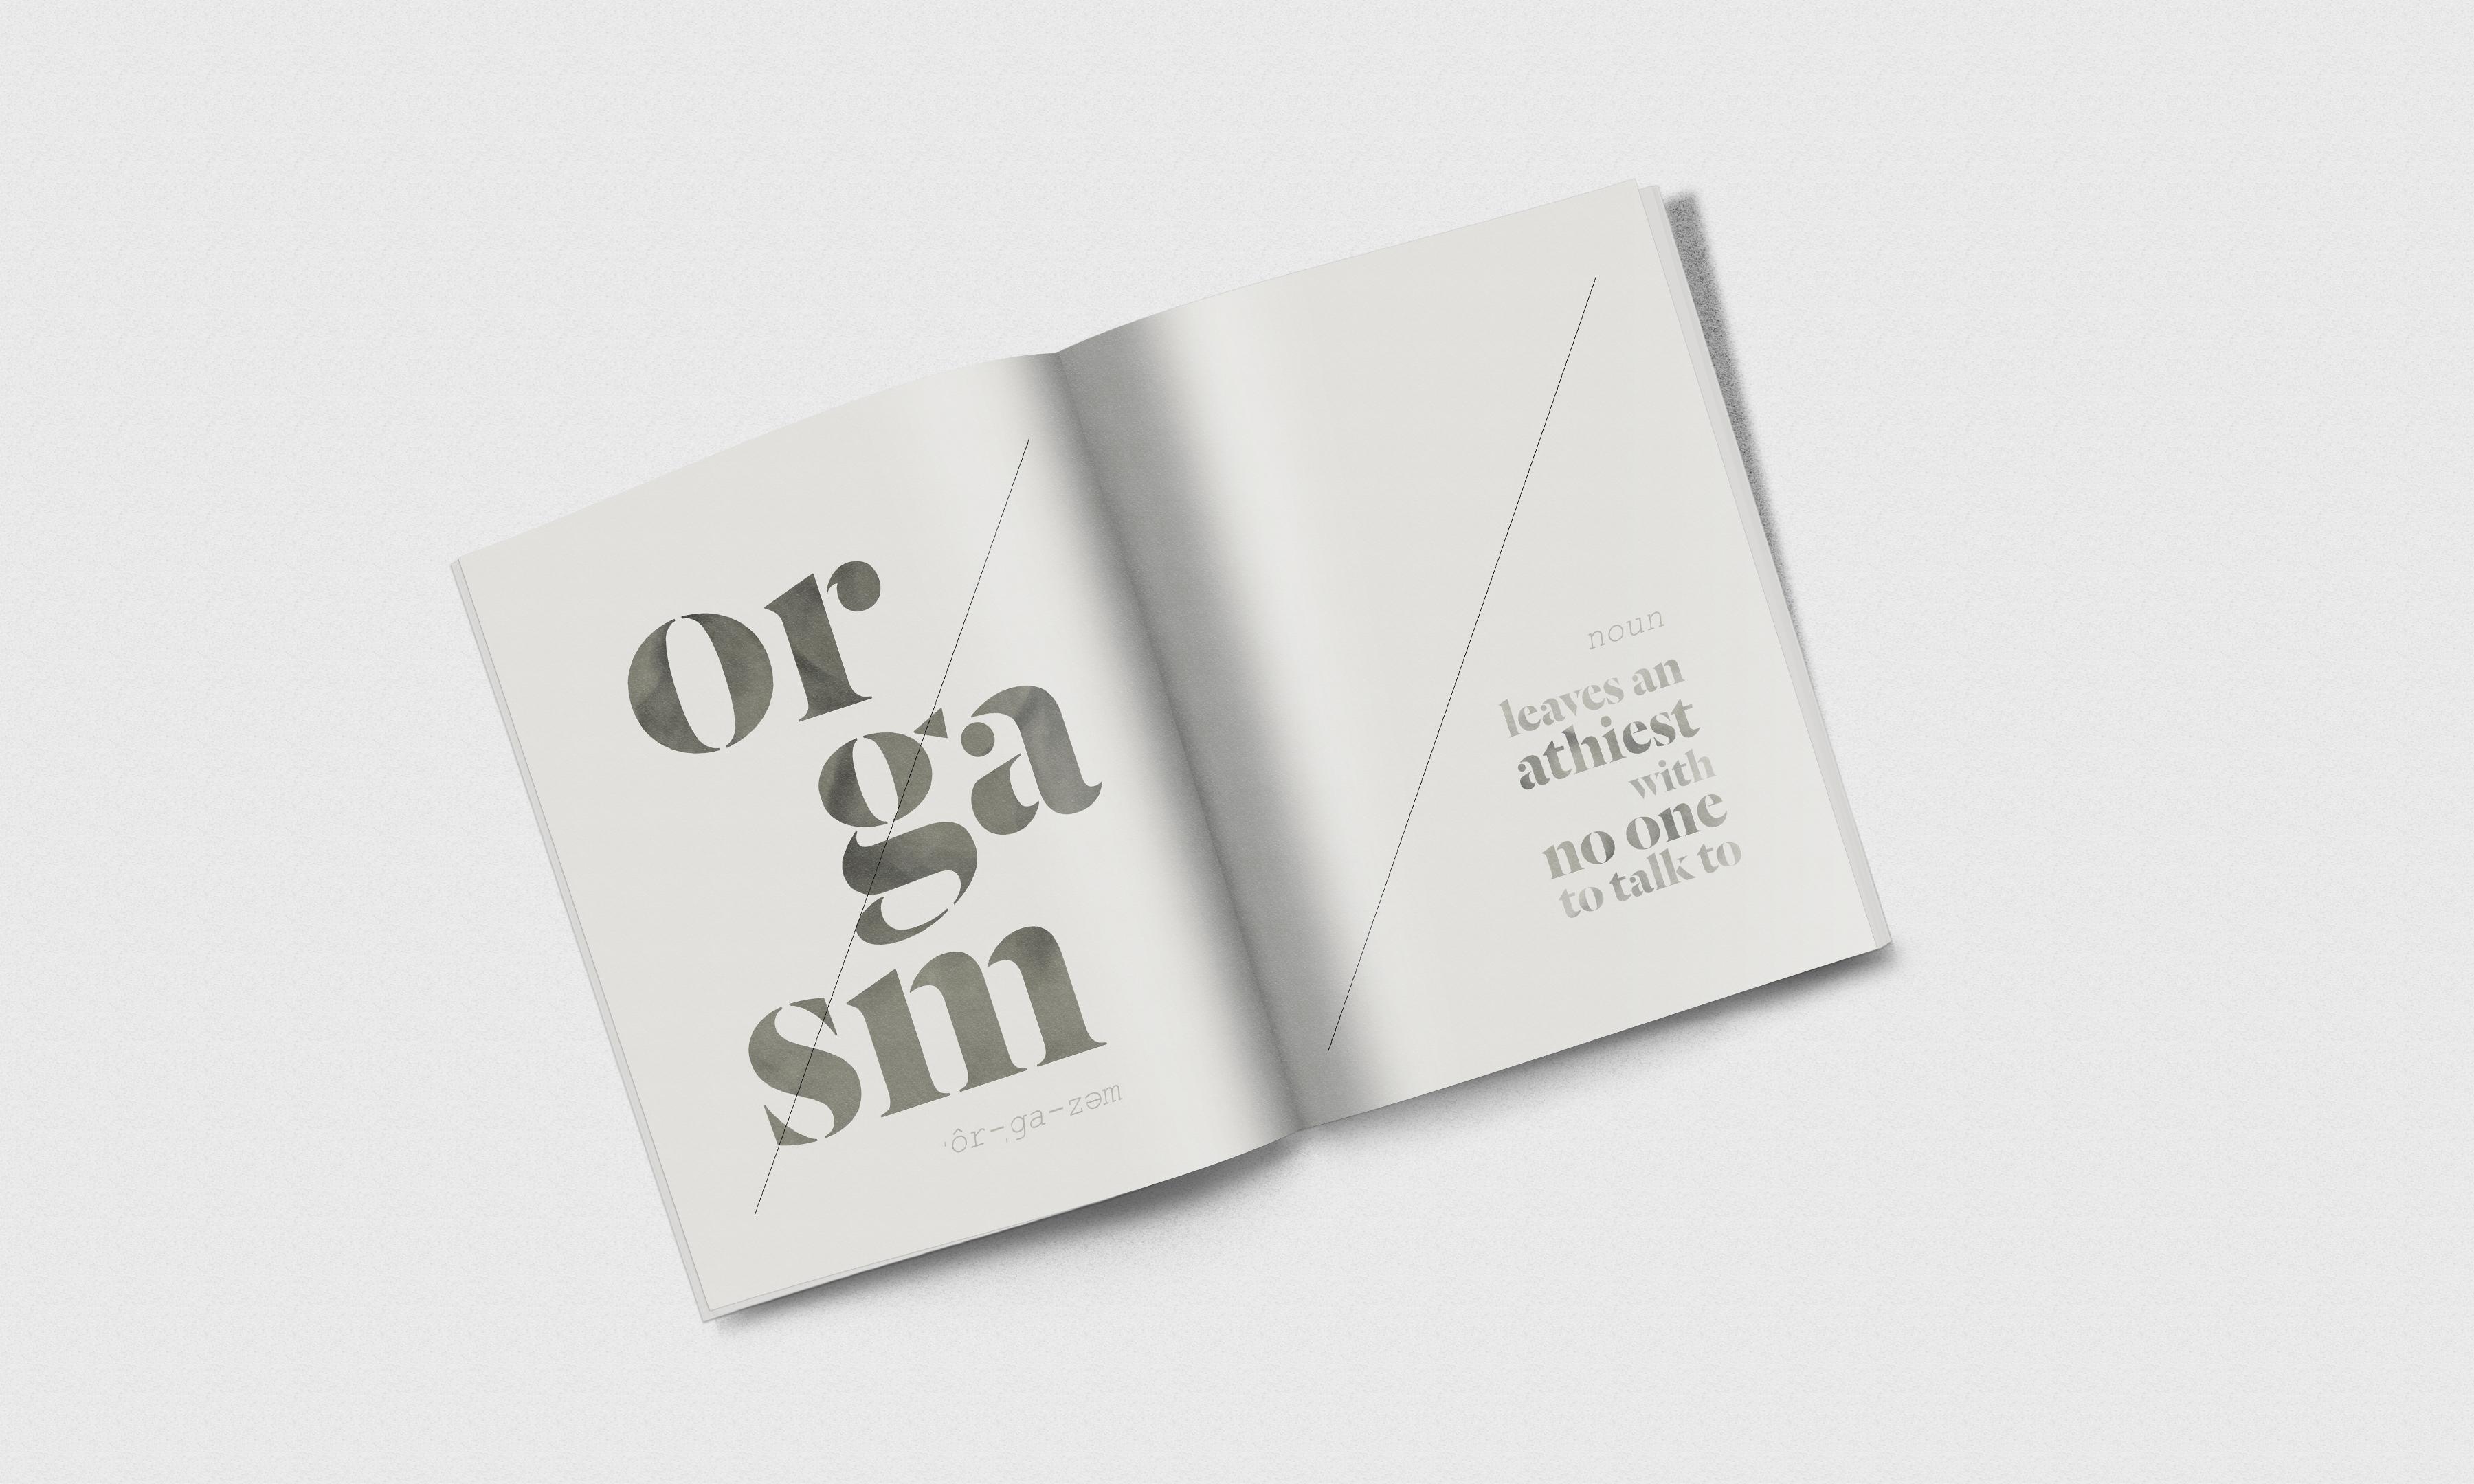 Photorealistic magazine mockup orgasm noun